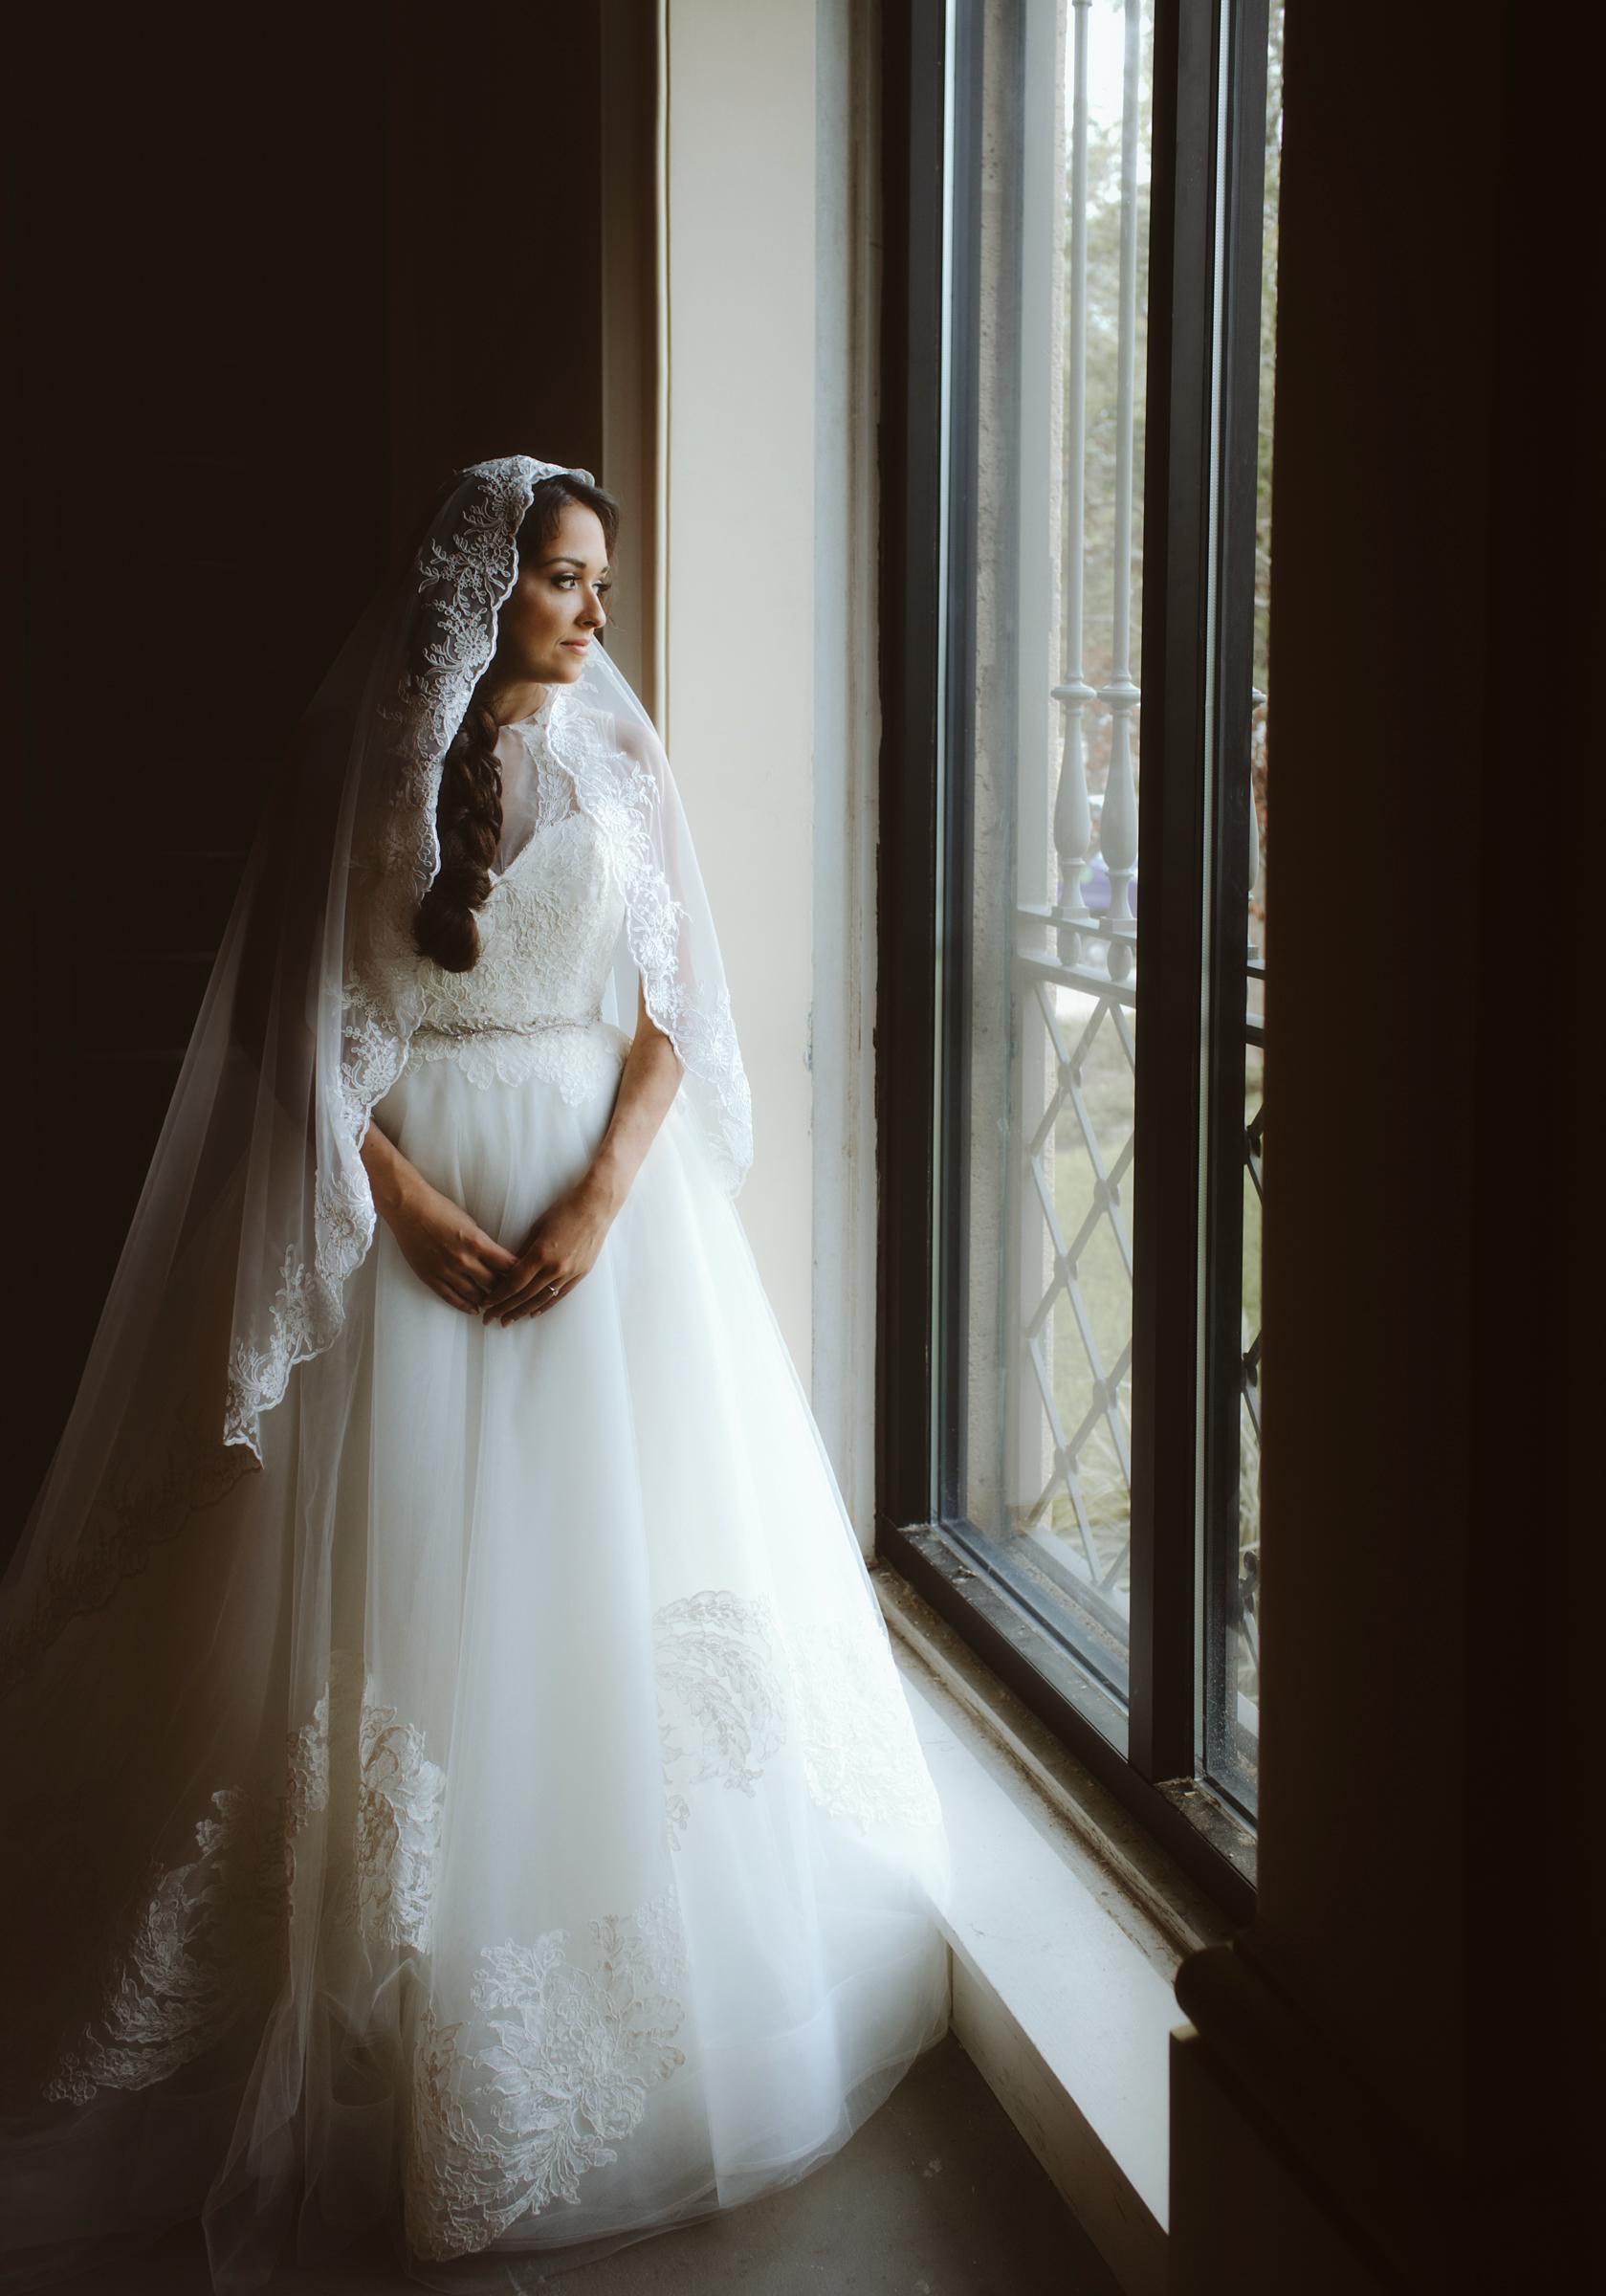 wedding day | MFA St Pete | Vanessa Boy Photography | vanessaboy.com-259.com |final.jpg